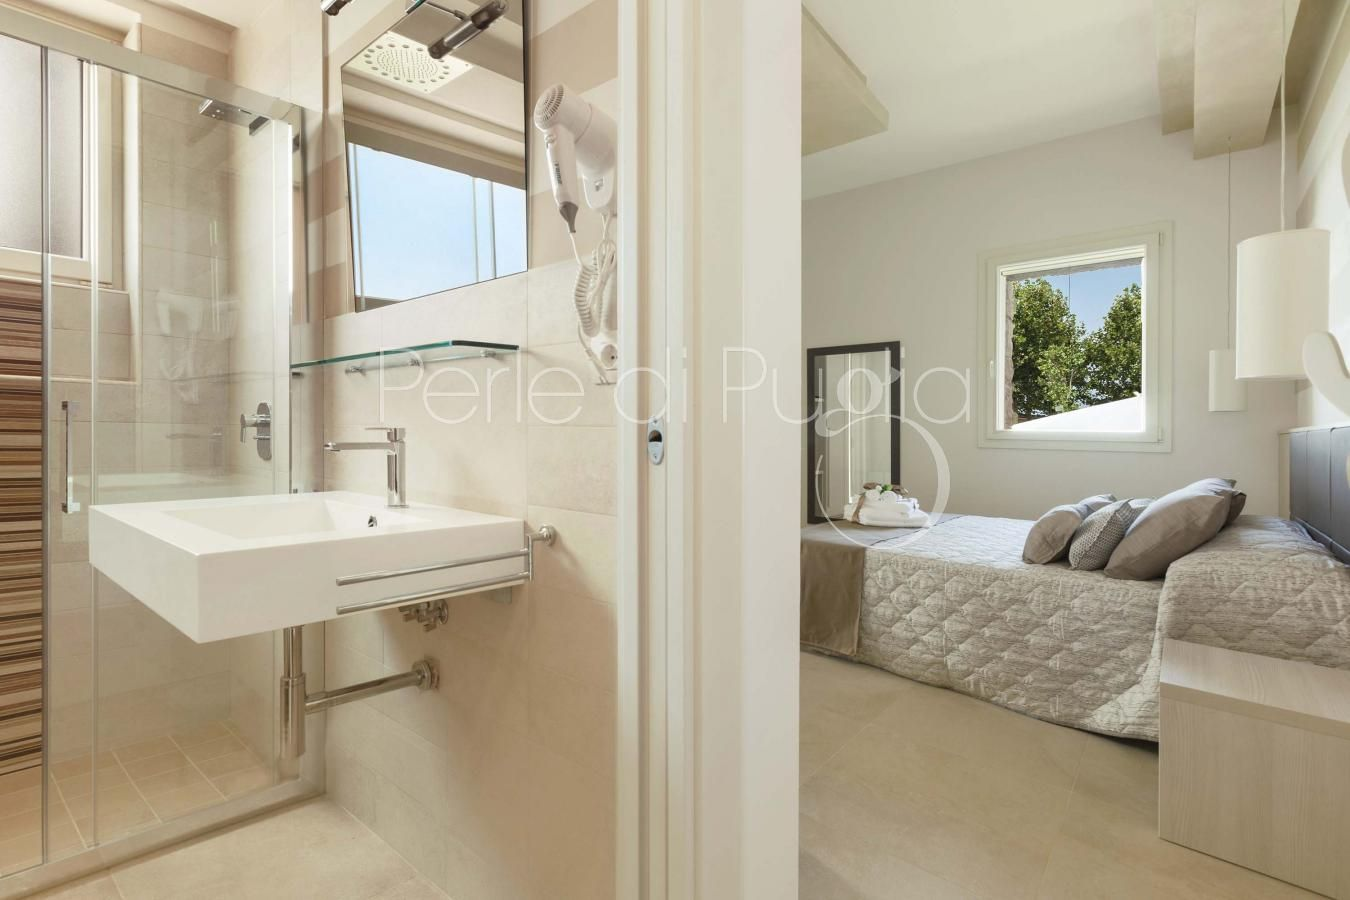 Carma is a design villa with swimming pool, solarium, tennis court ...